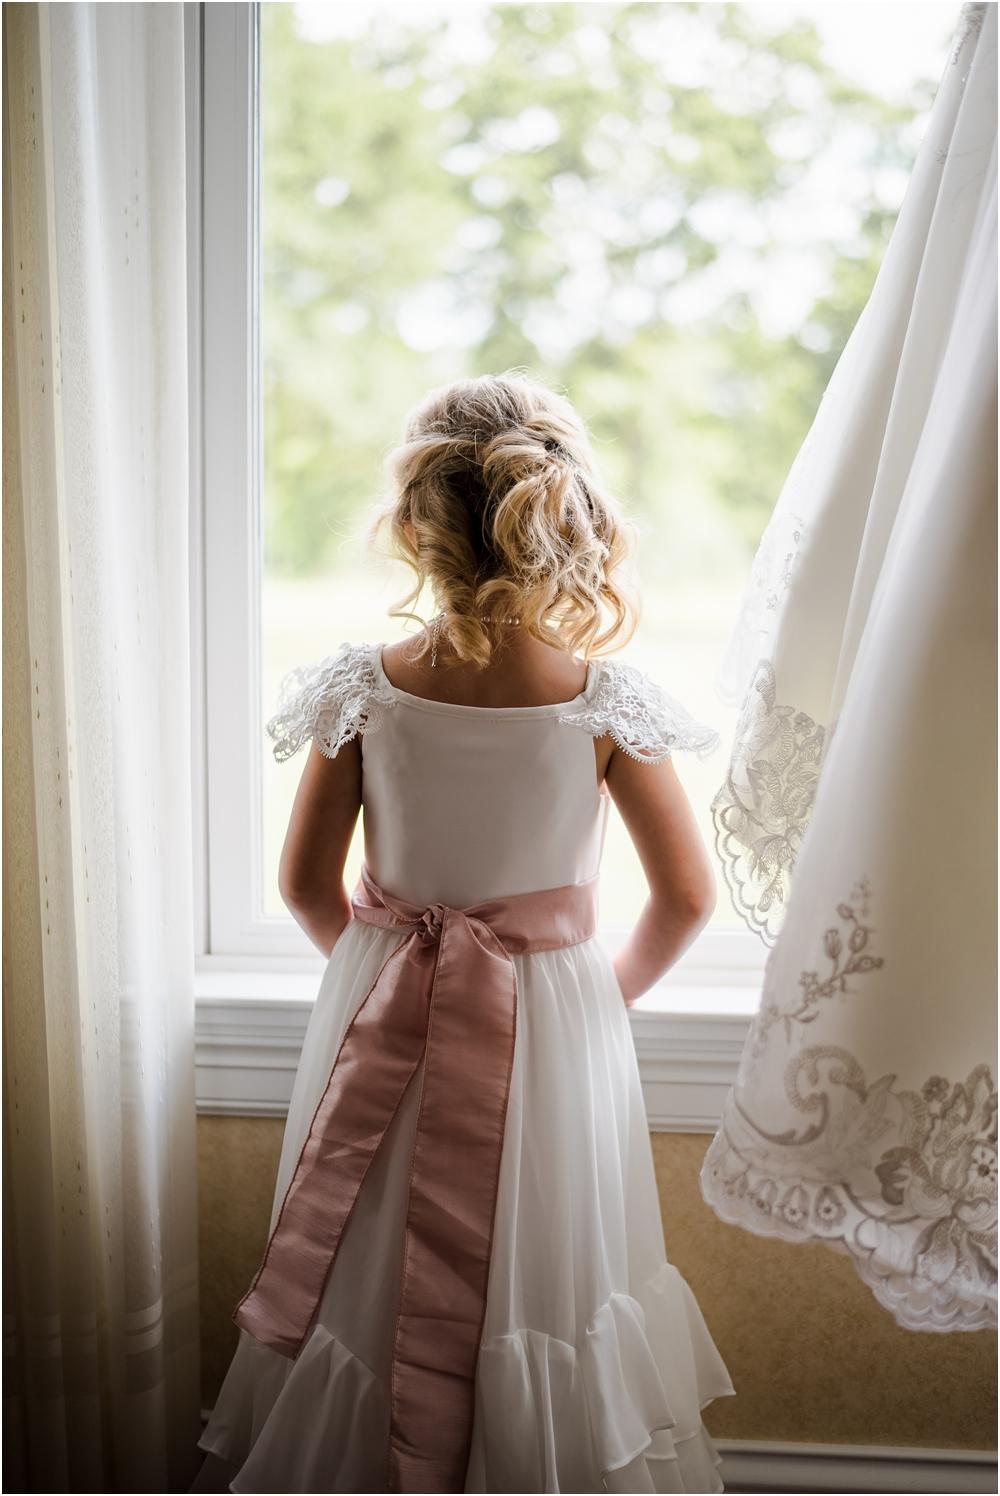 marianna-florida-wedding-photographer-kiersten-grant-23.jpg